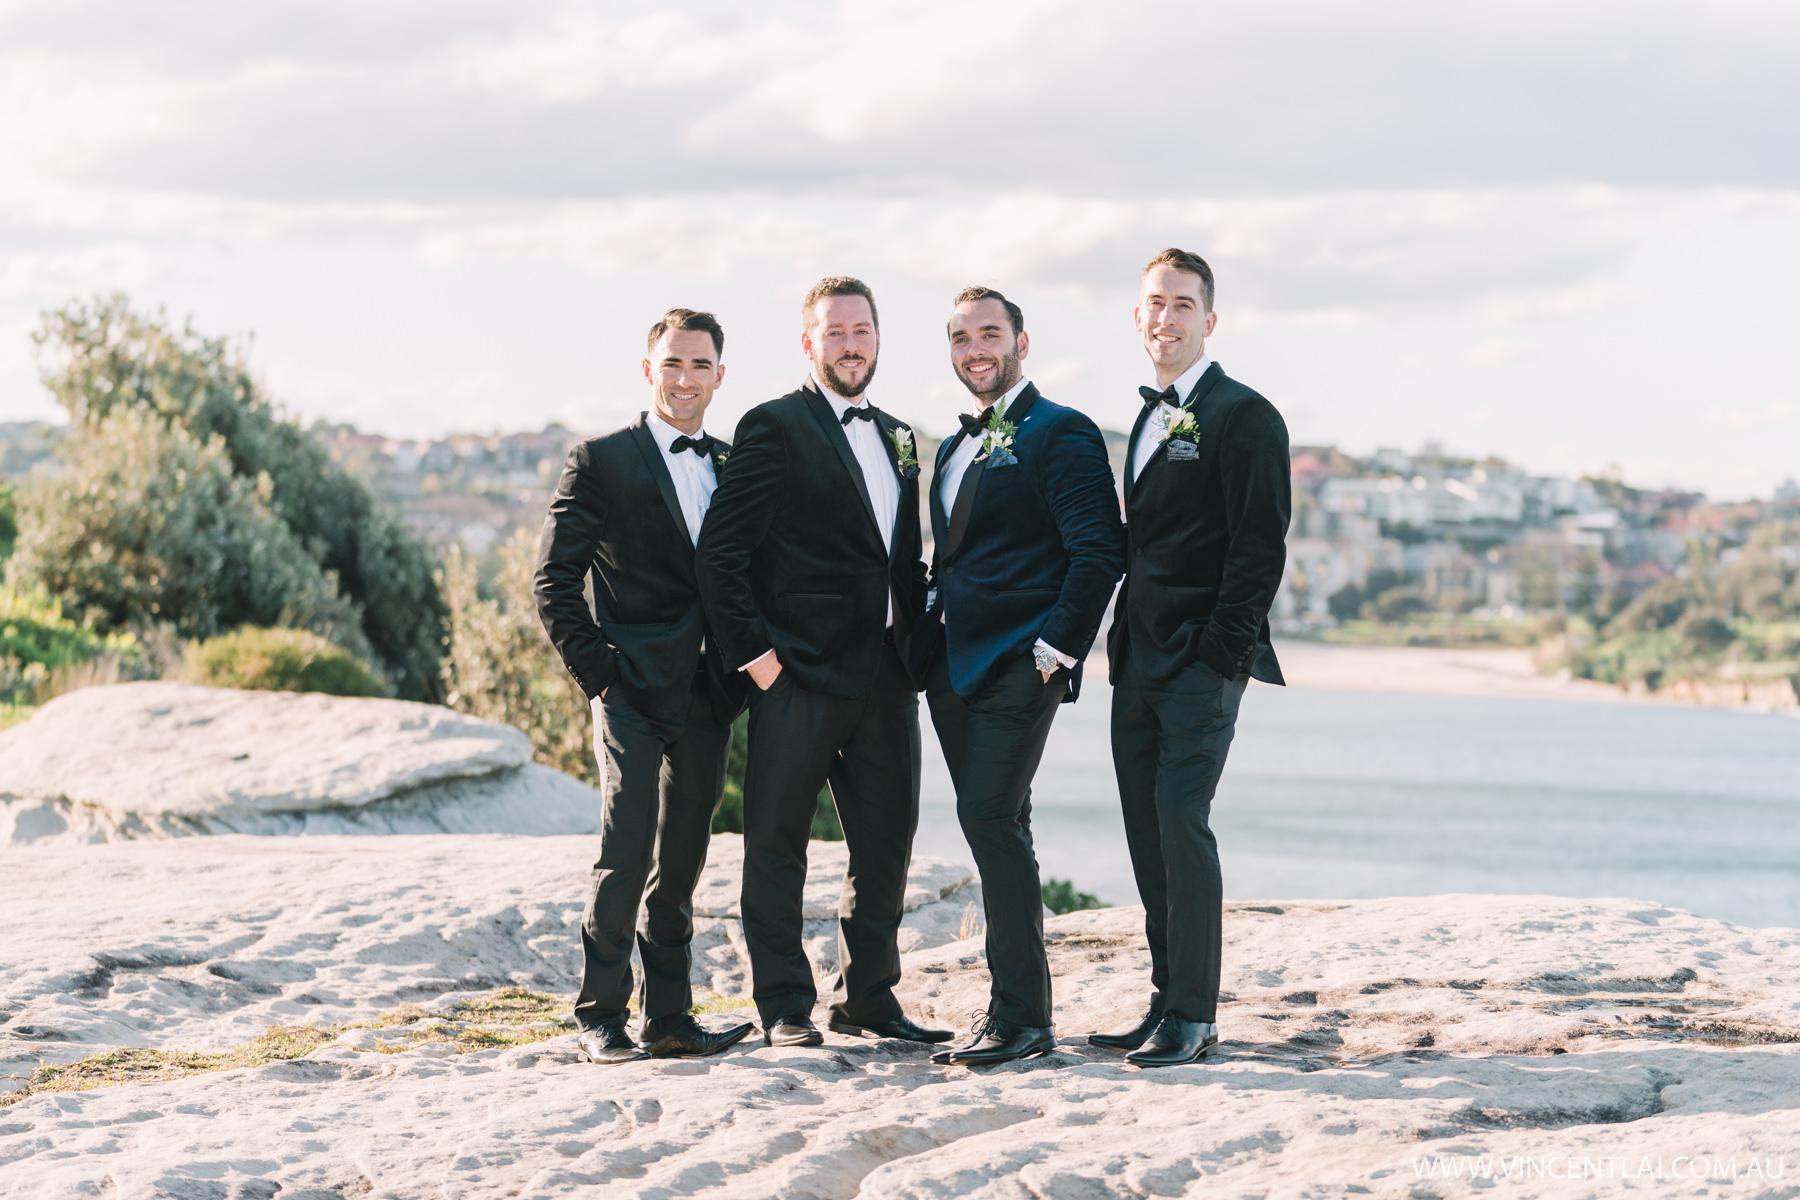 Wedding at Wylie's Baths Coogee Beach